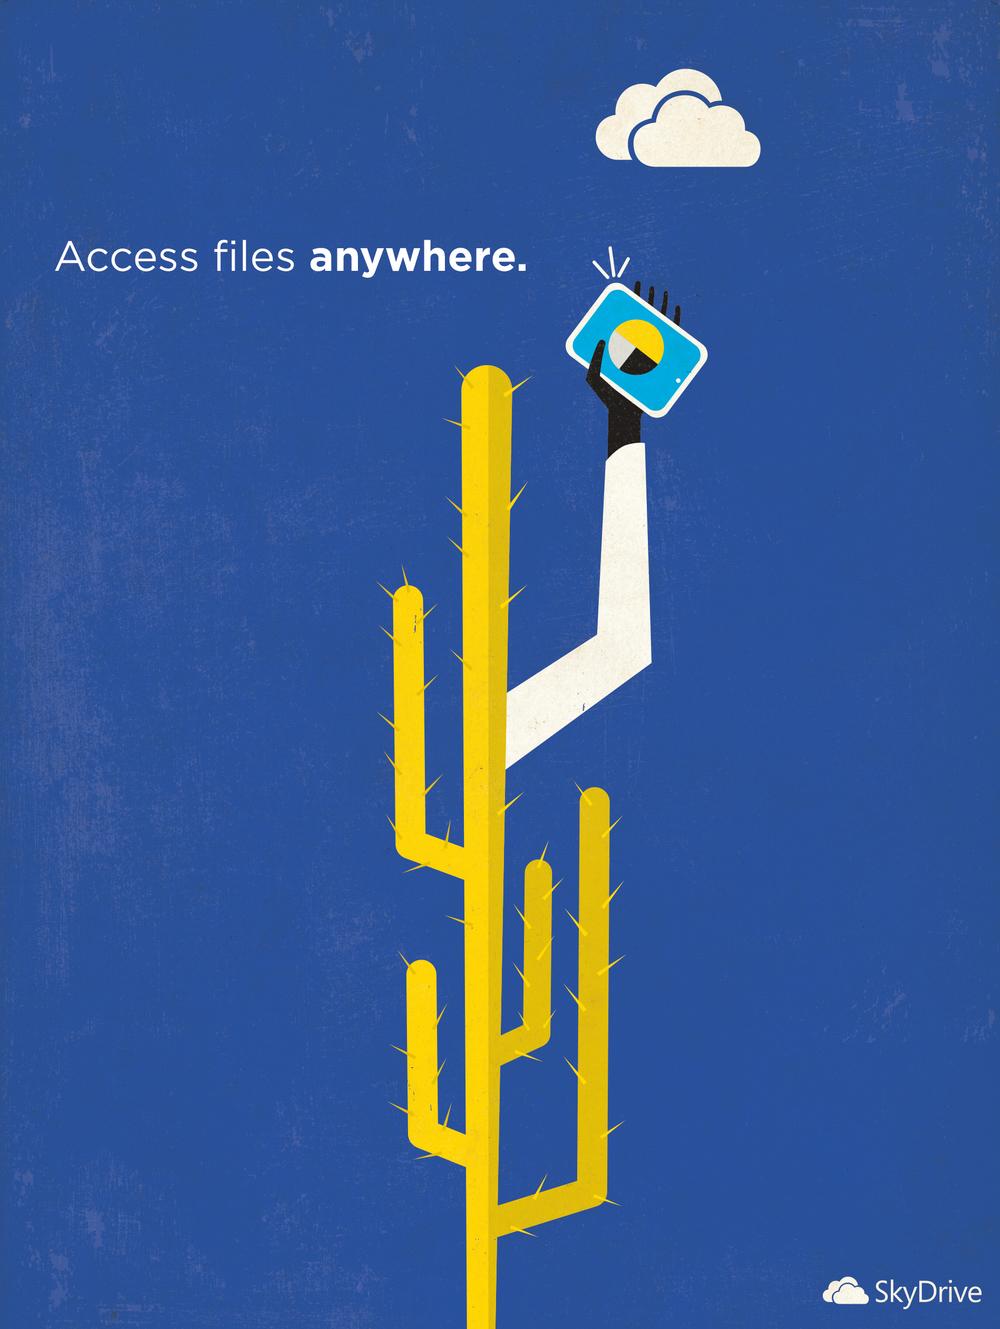 Skydrive_afa_cactus.jpg